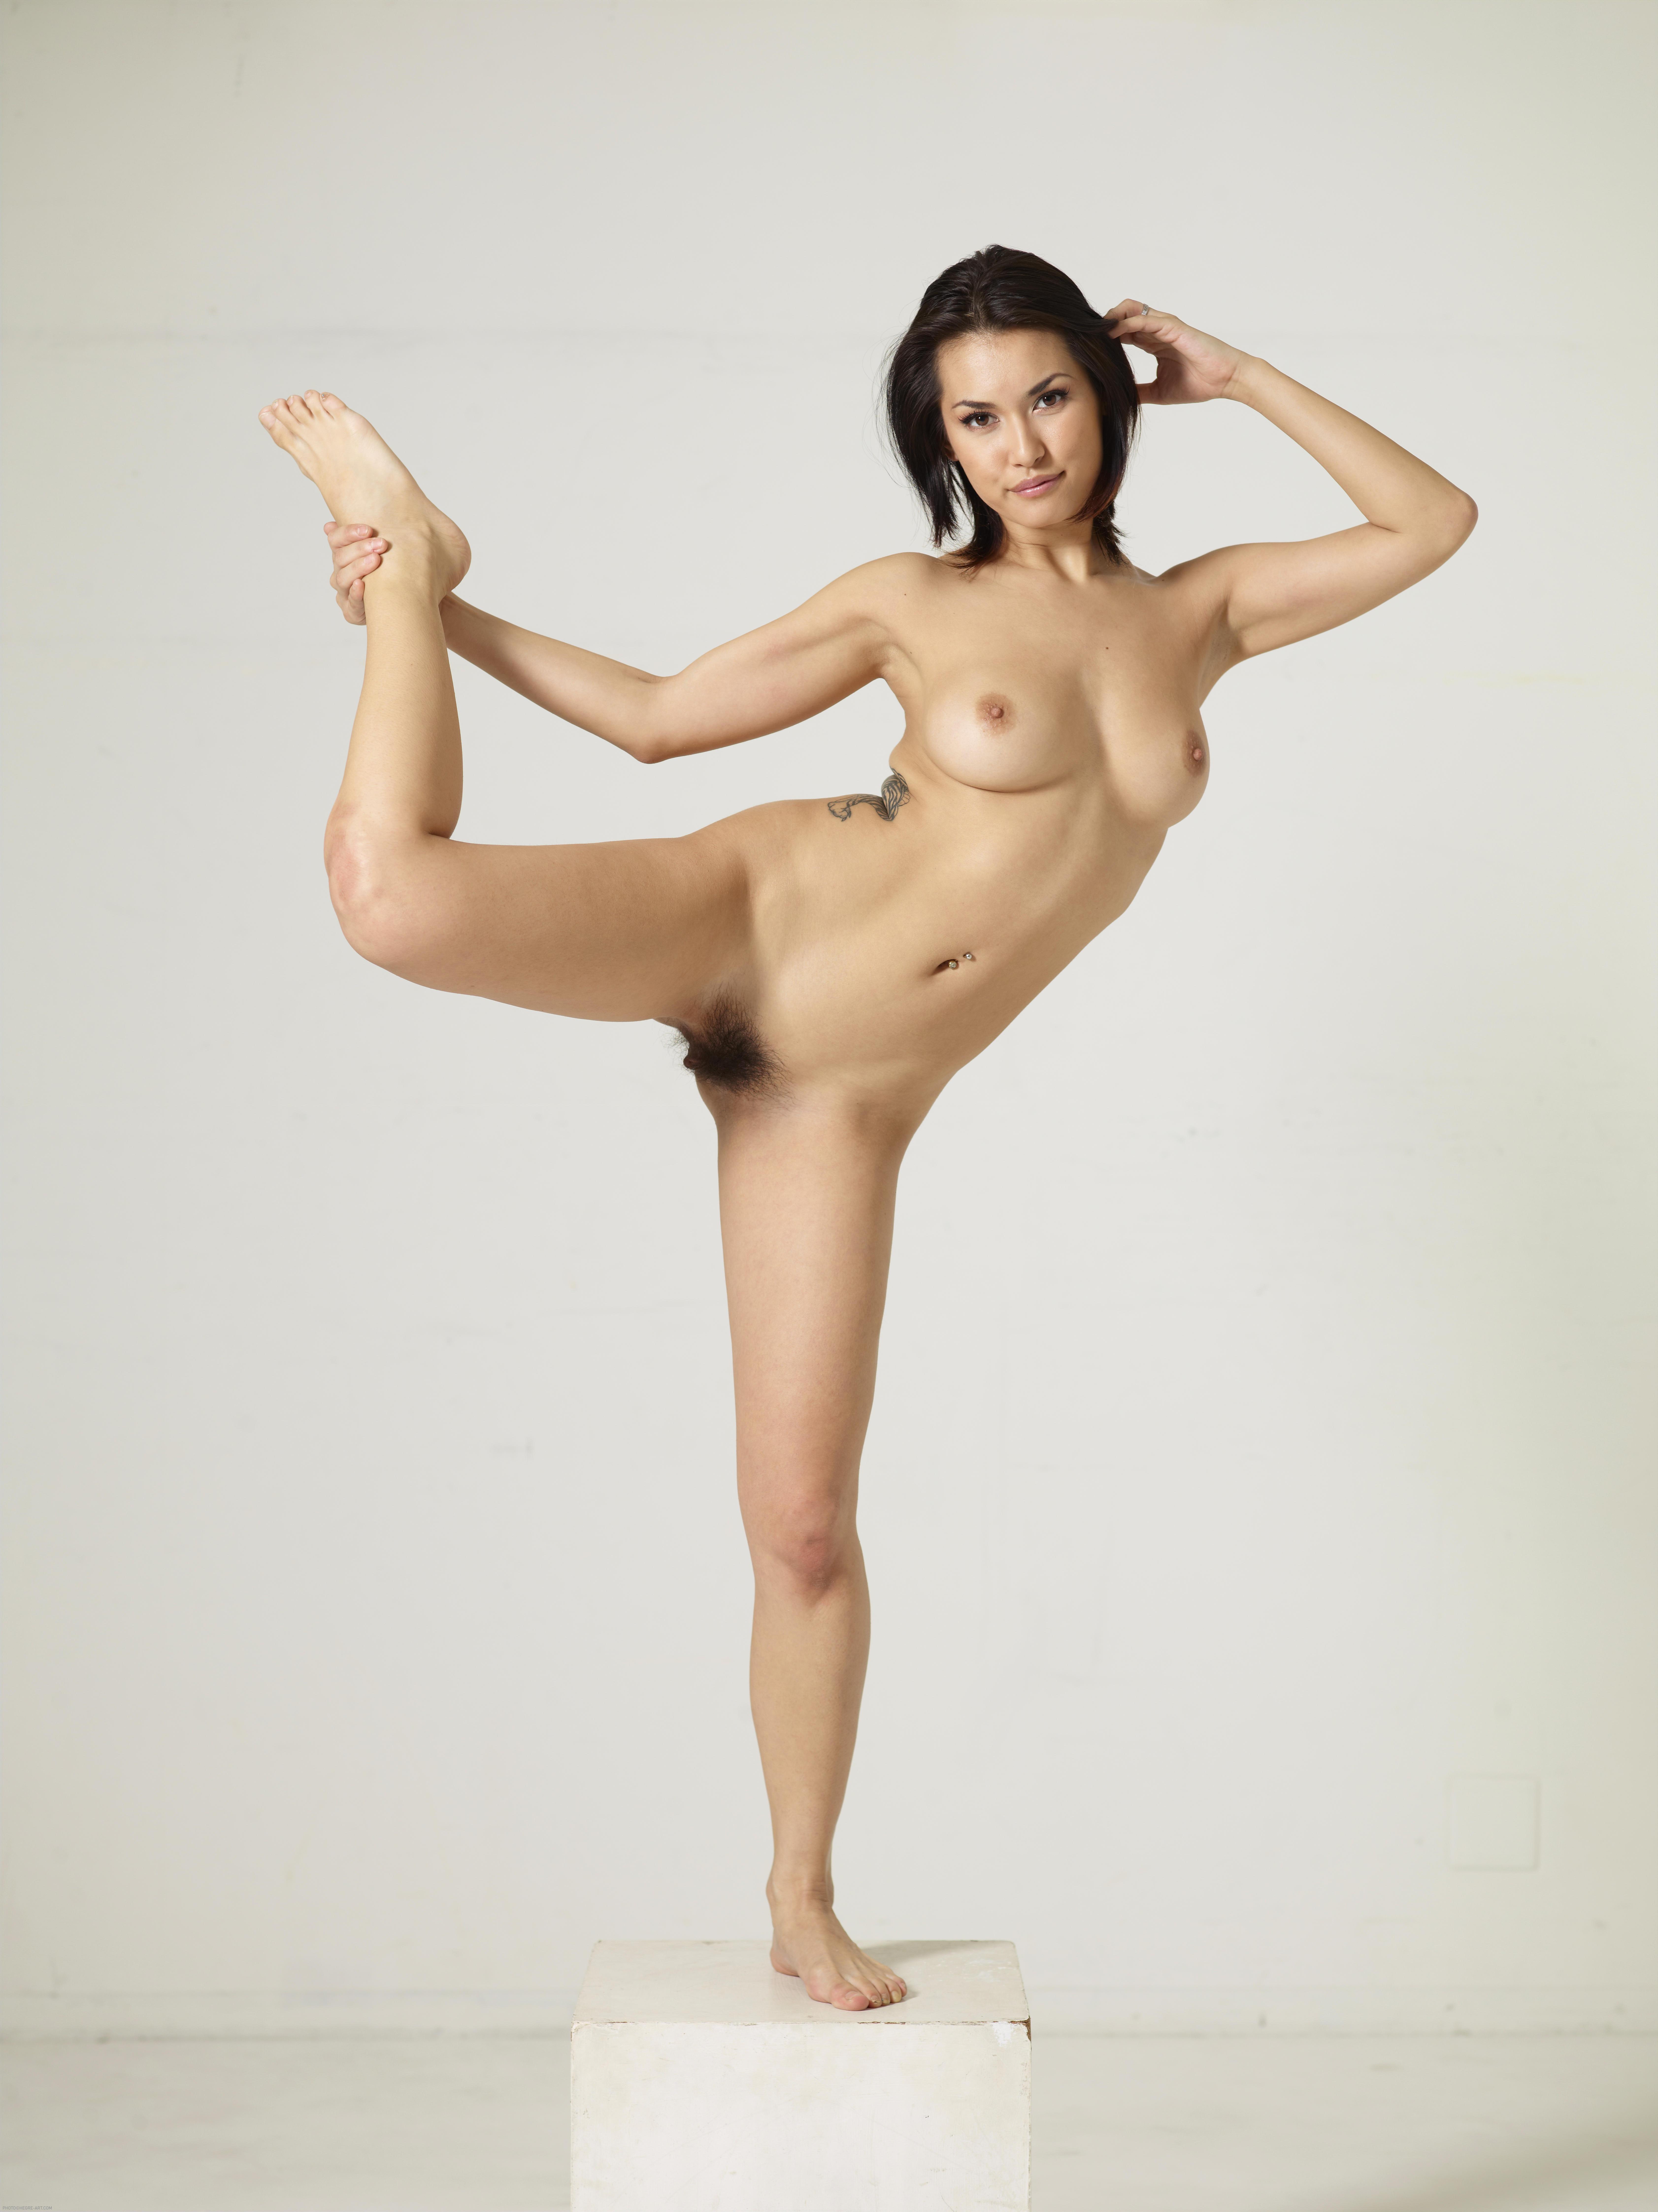 Jacqueline macinnes wood fake porn pics